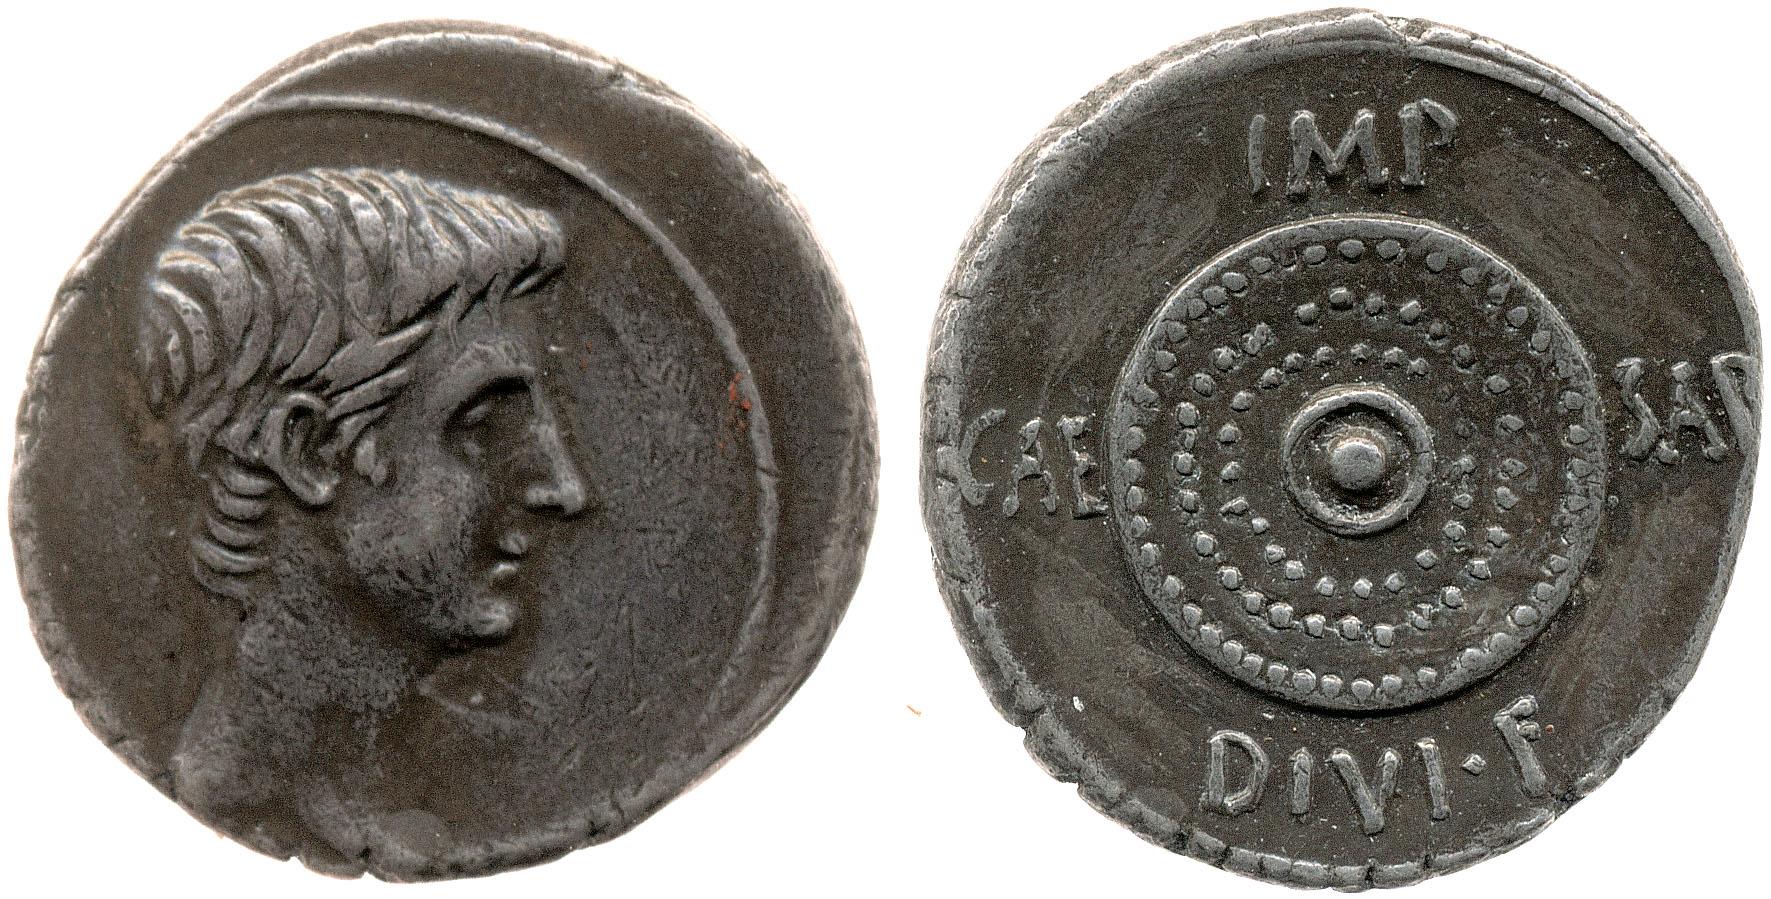 You are currently viewing 2035AU – Denier Octave – Caius Julius Cæsar Octavianus